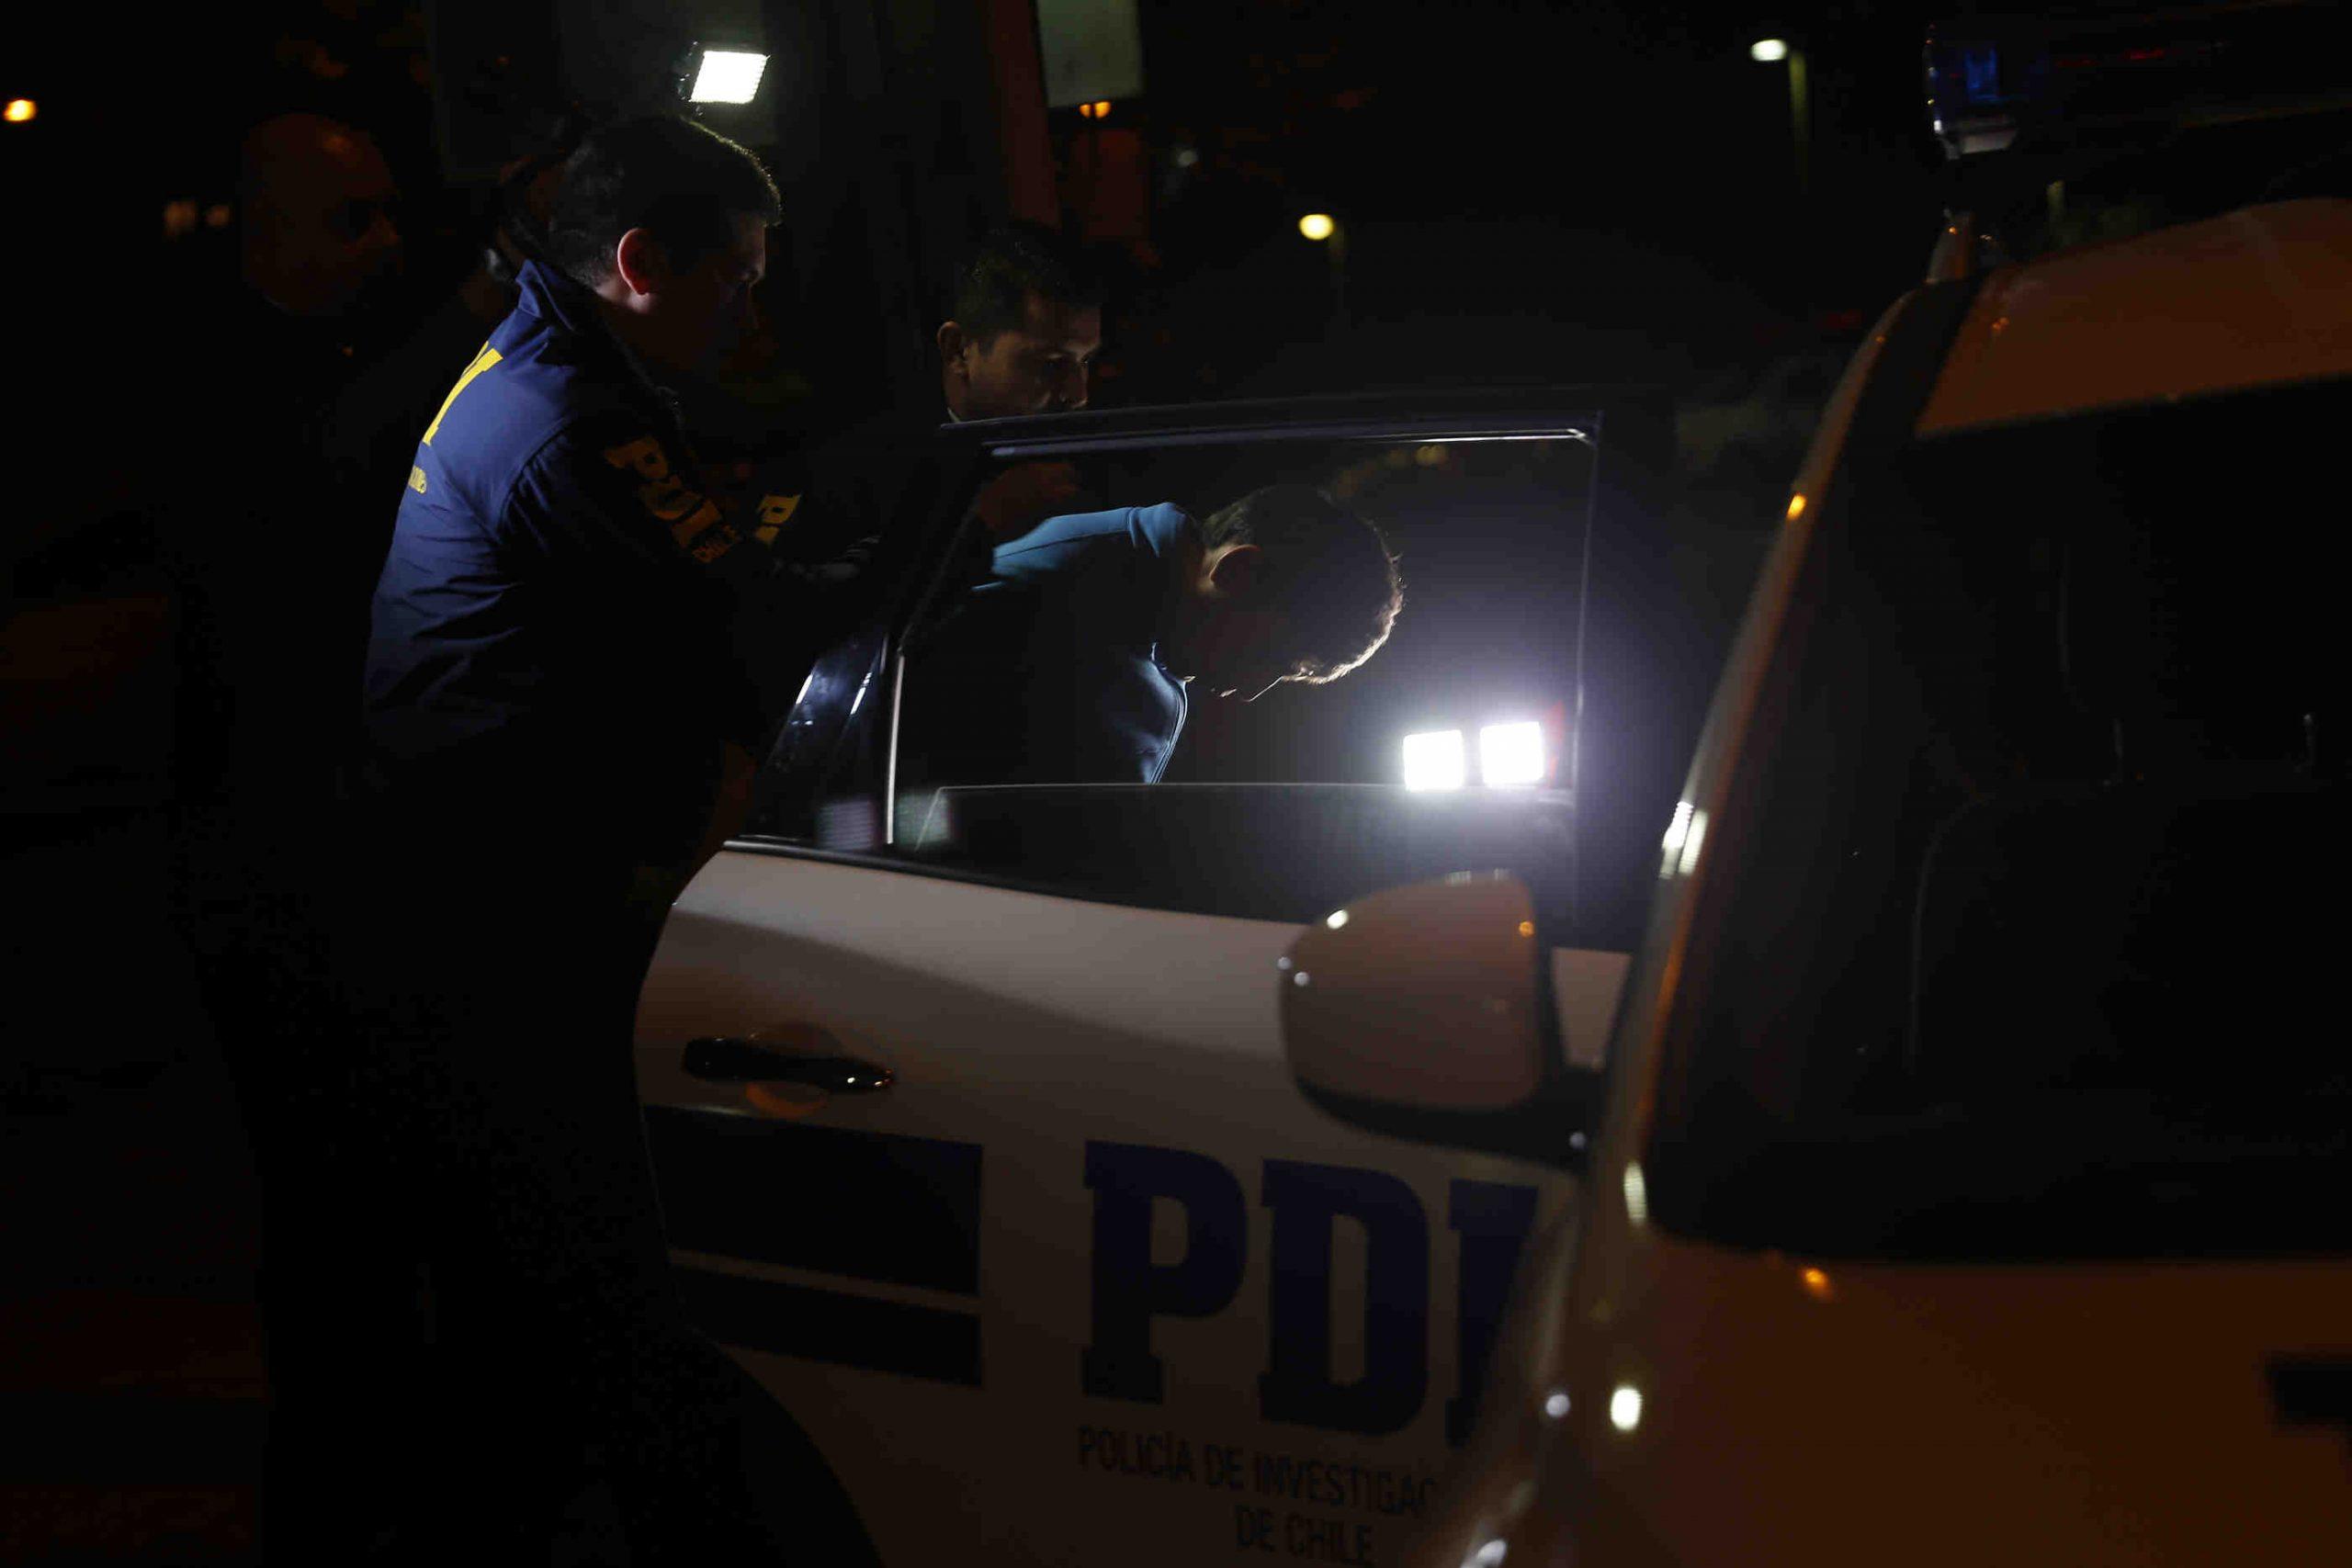 PDI detuvo a adolescente con amplio prontuario policial en Coyhaique